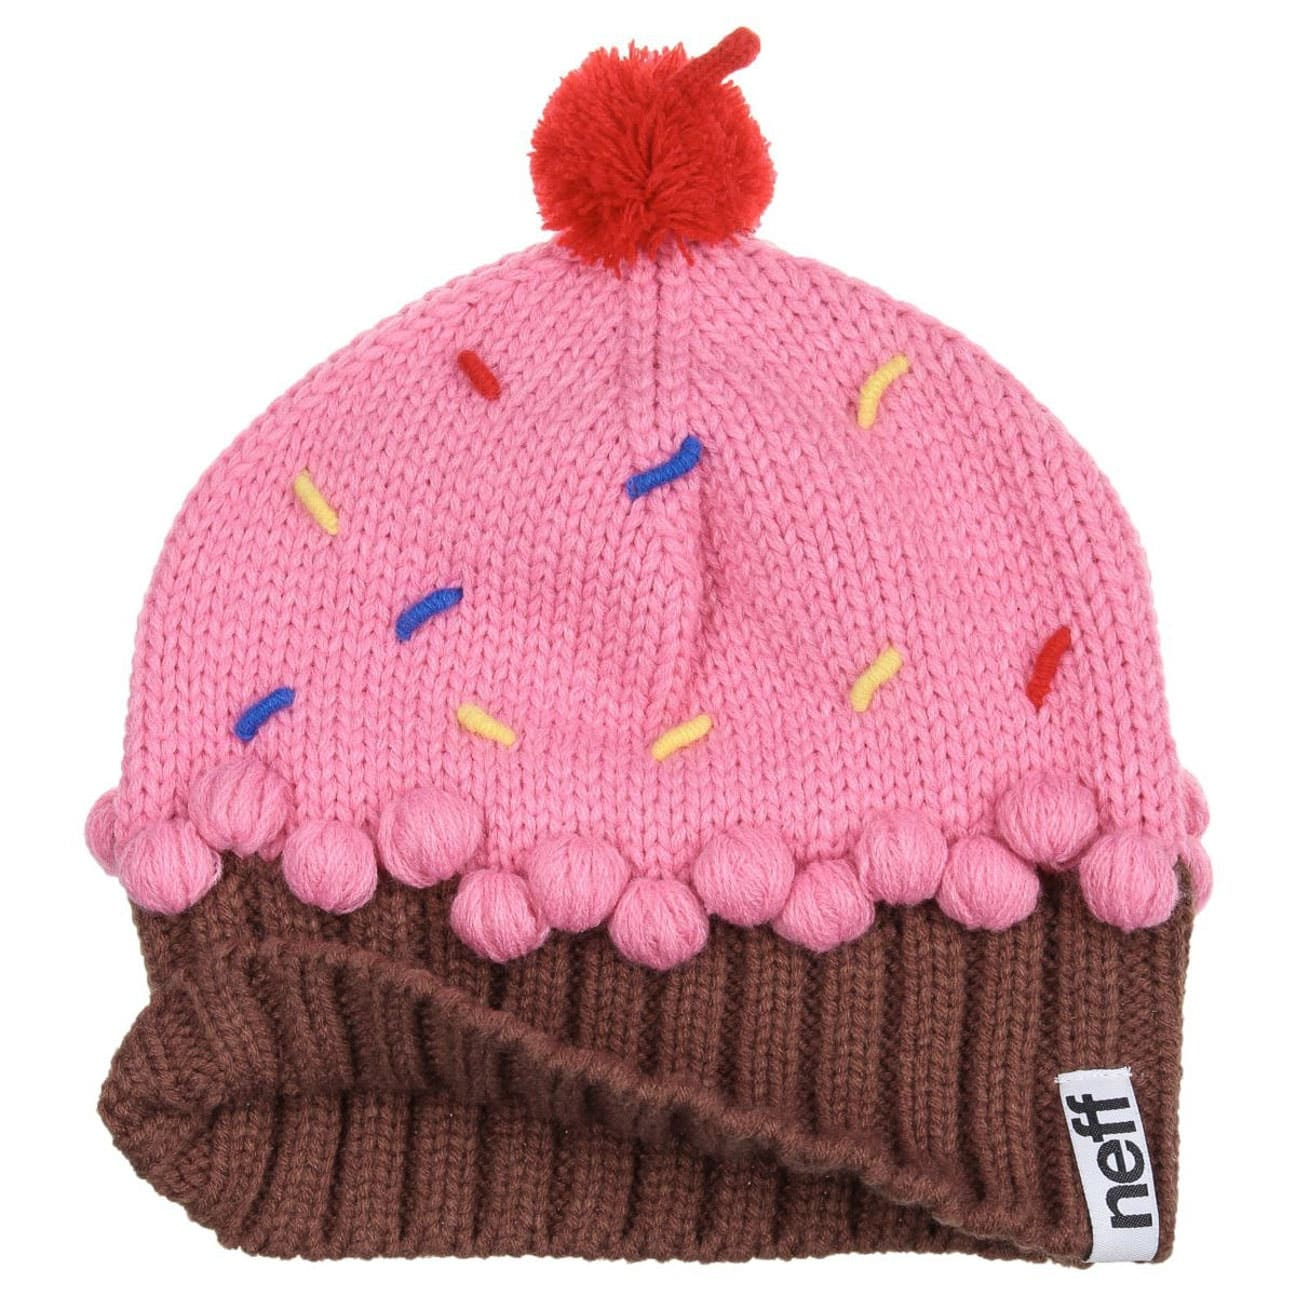 a5675d2fc8739 Cupcake Beanie by neff - rose 2 ...